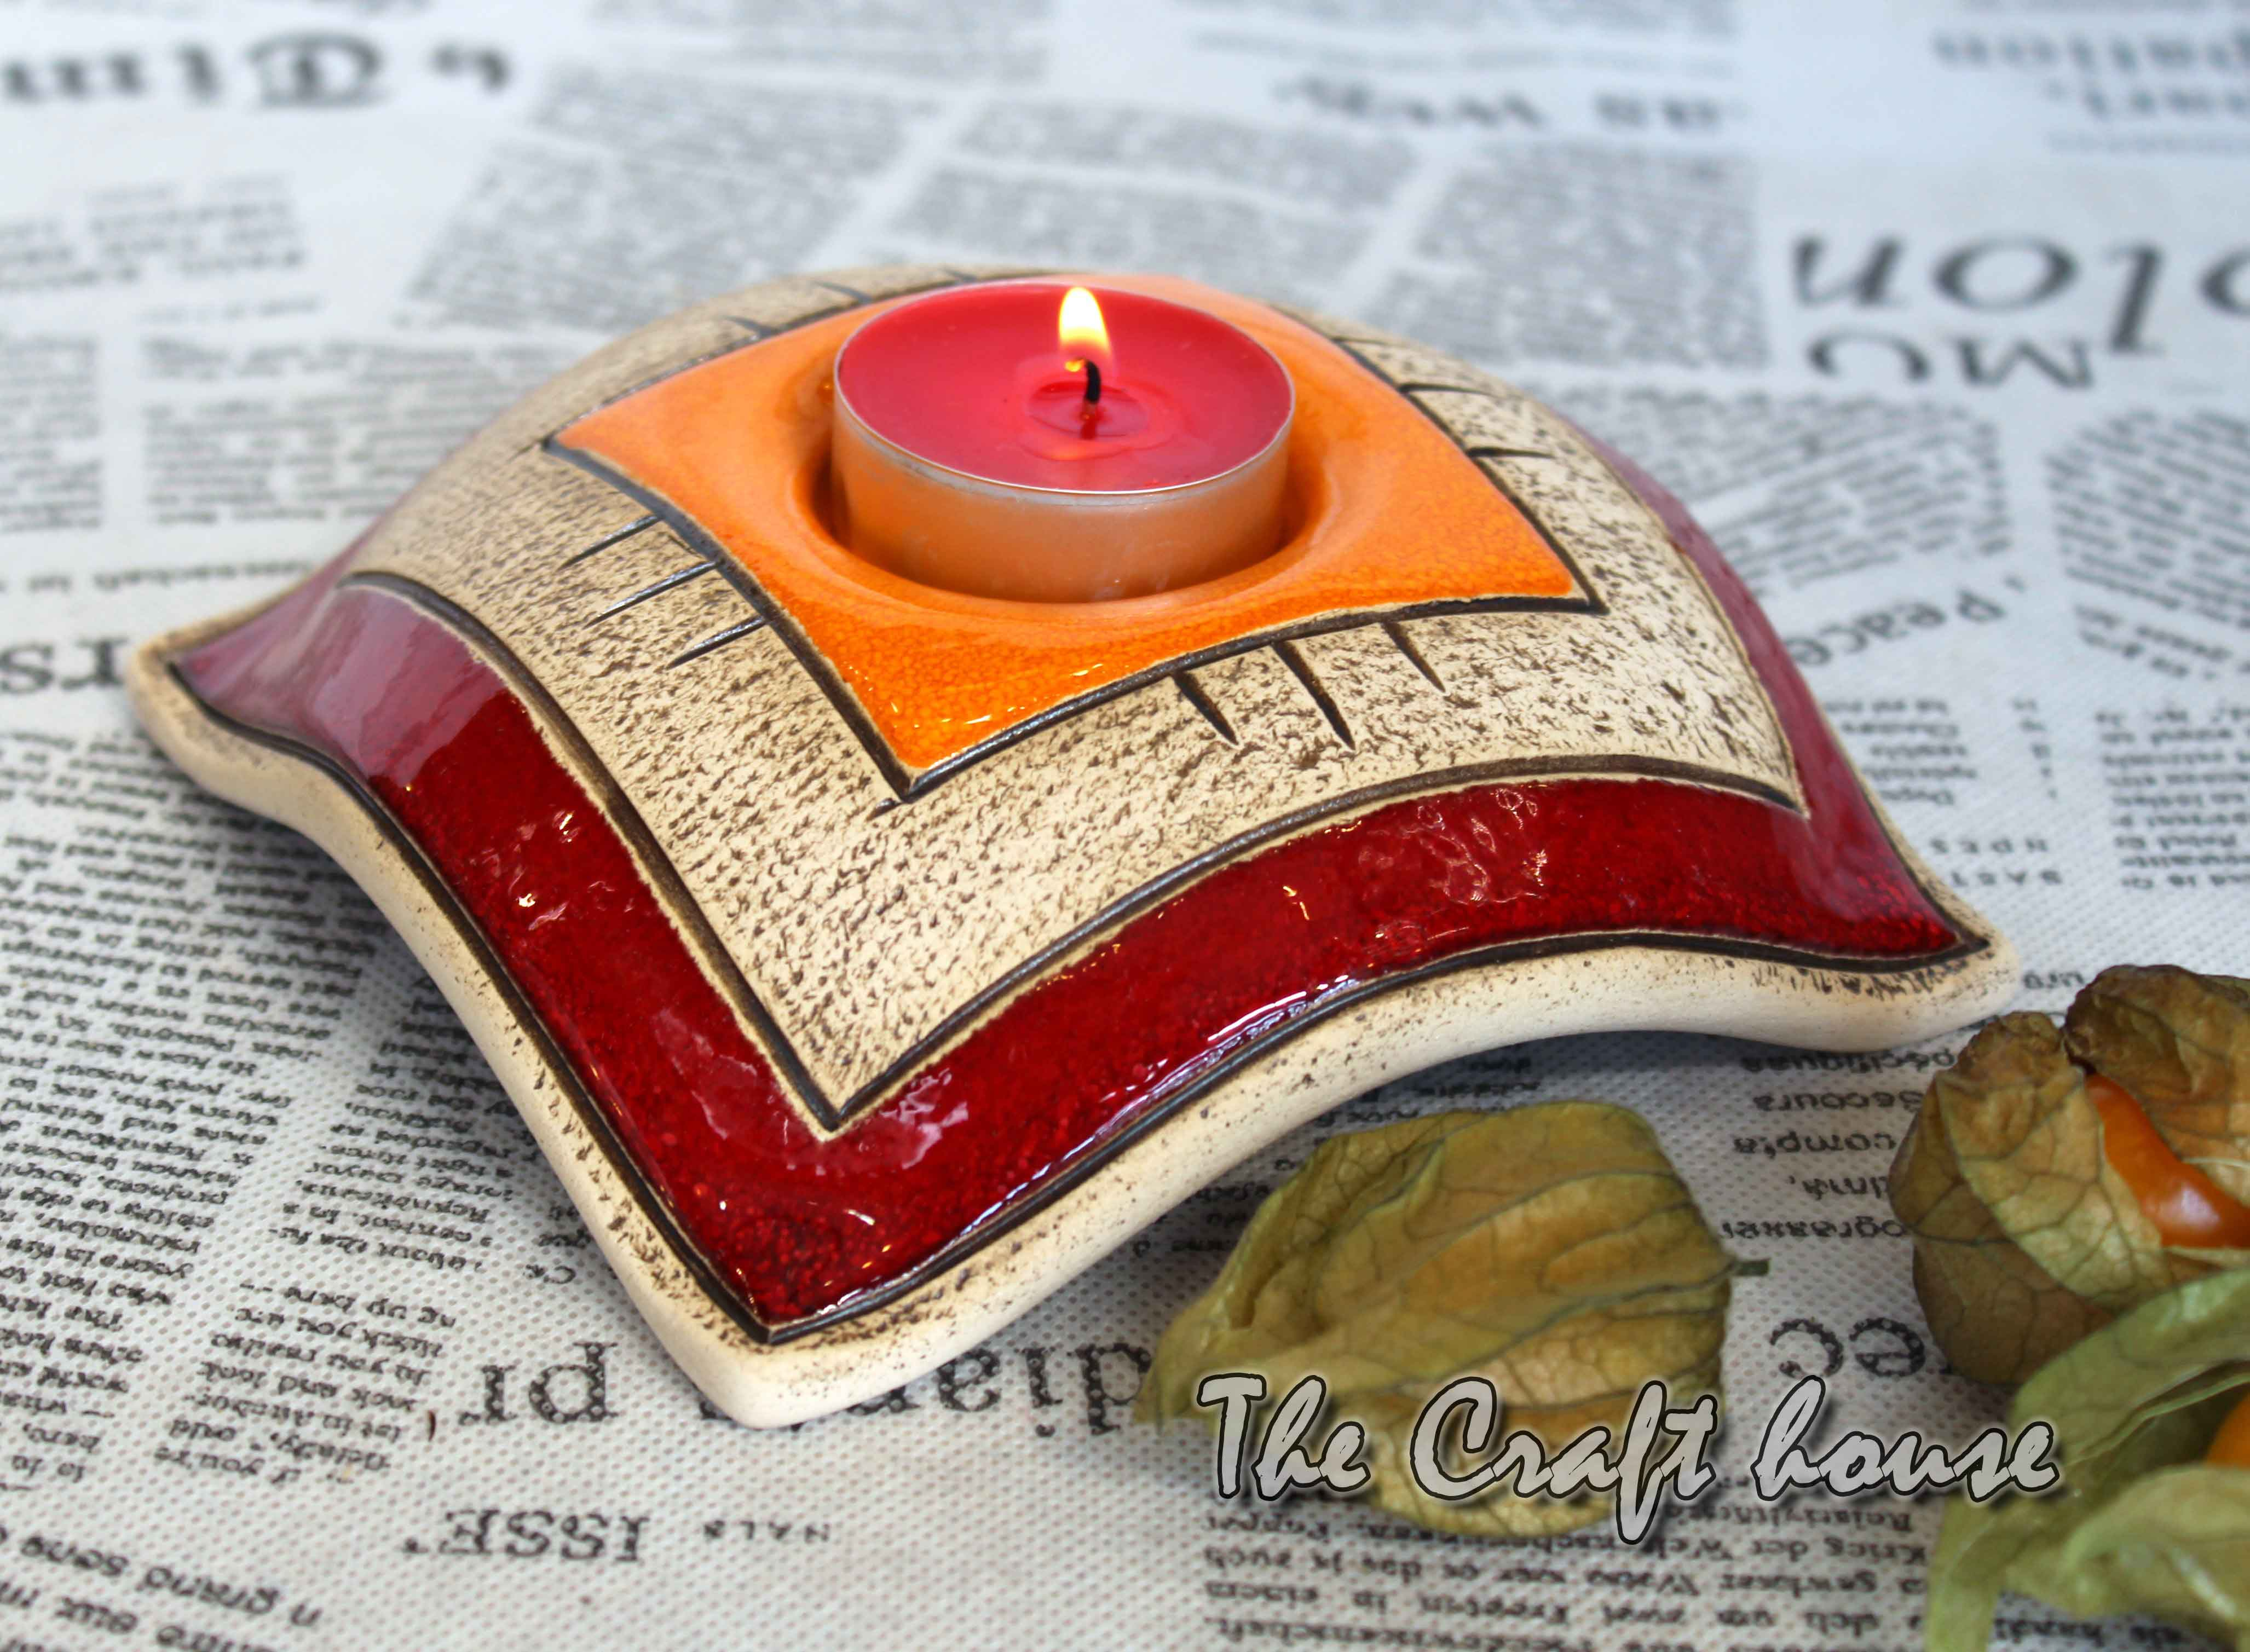 Candlesick